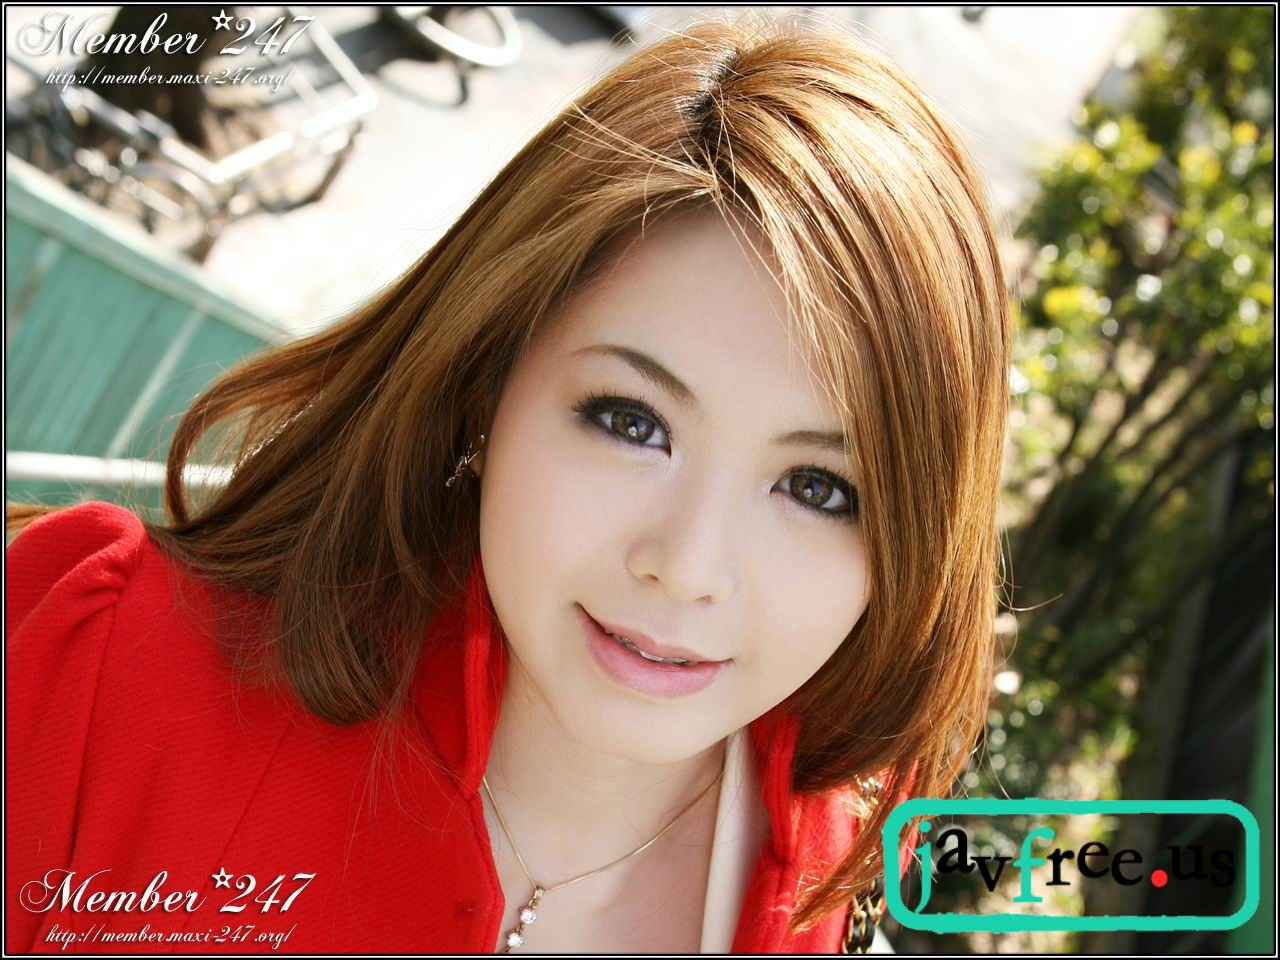 MAXI 247 あきみ(285 akimi) Maxi 247